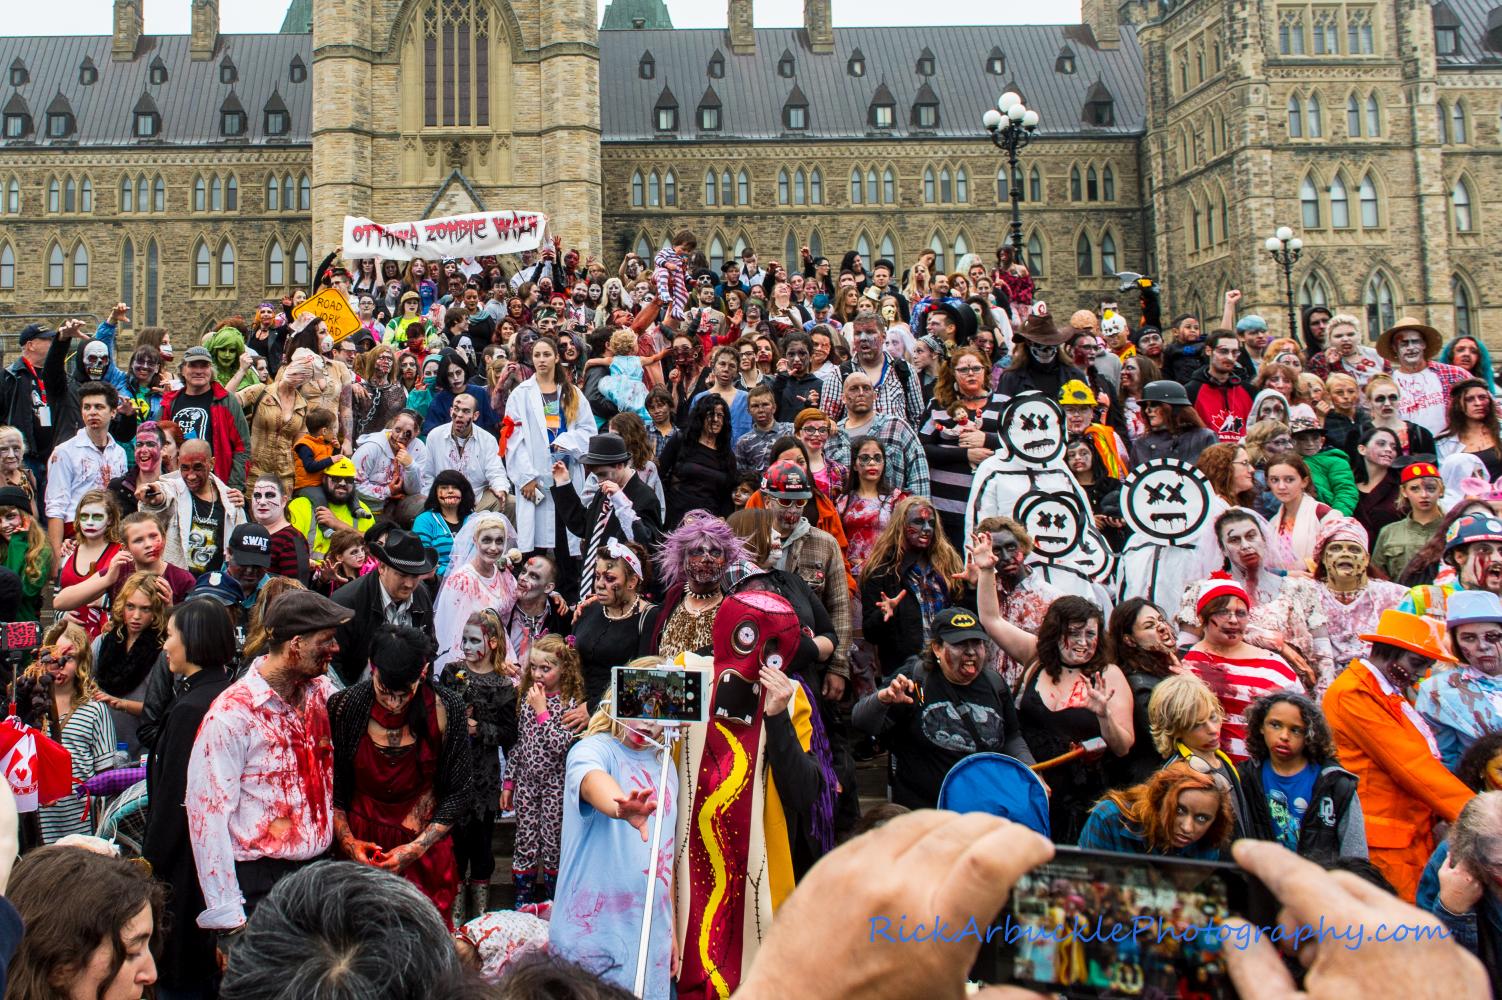 Ottawa Zombie Walk - 2016  69